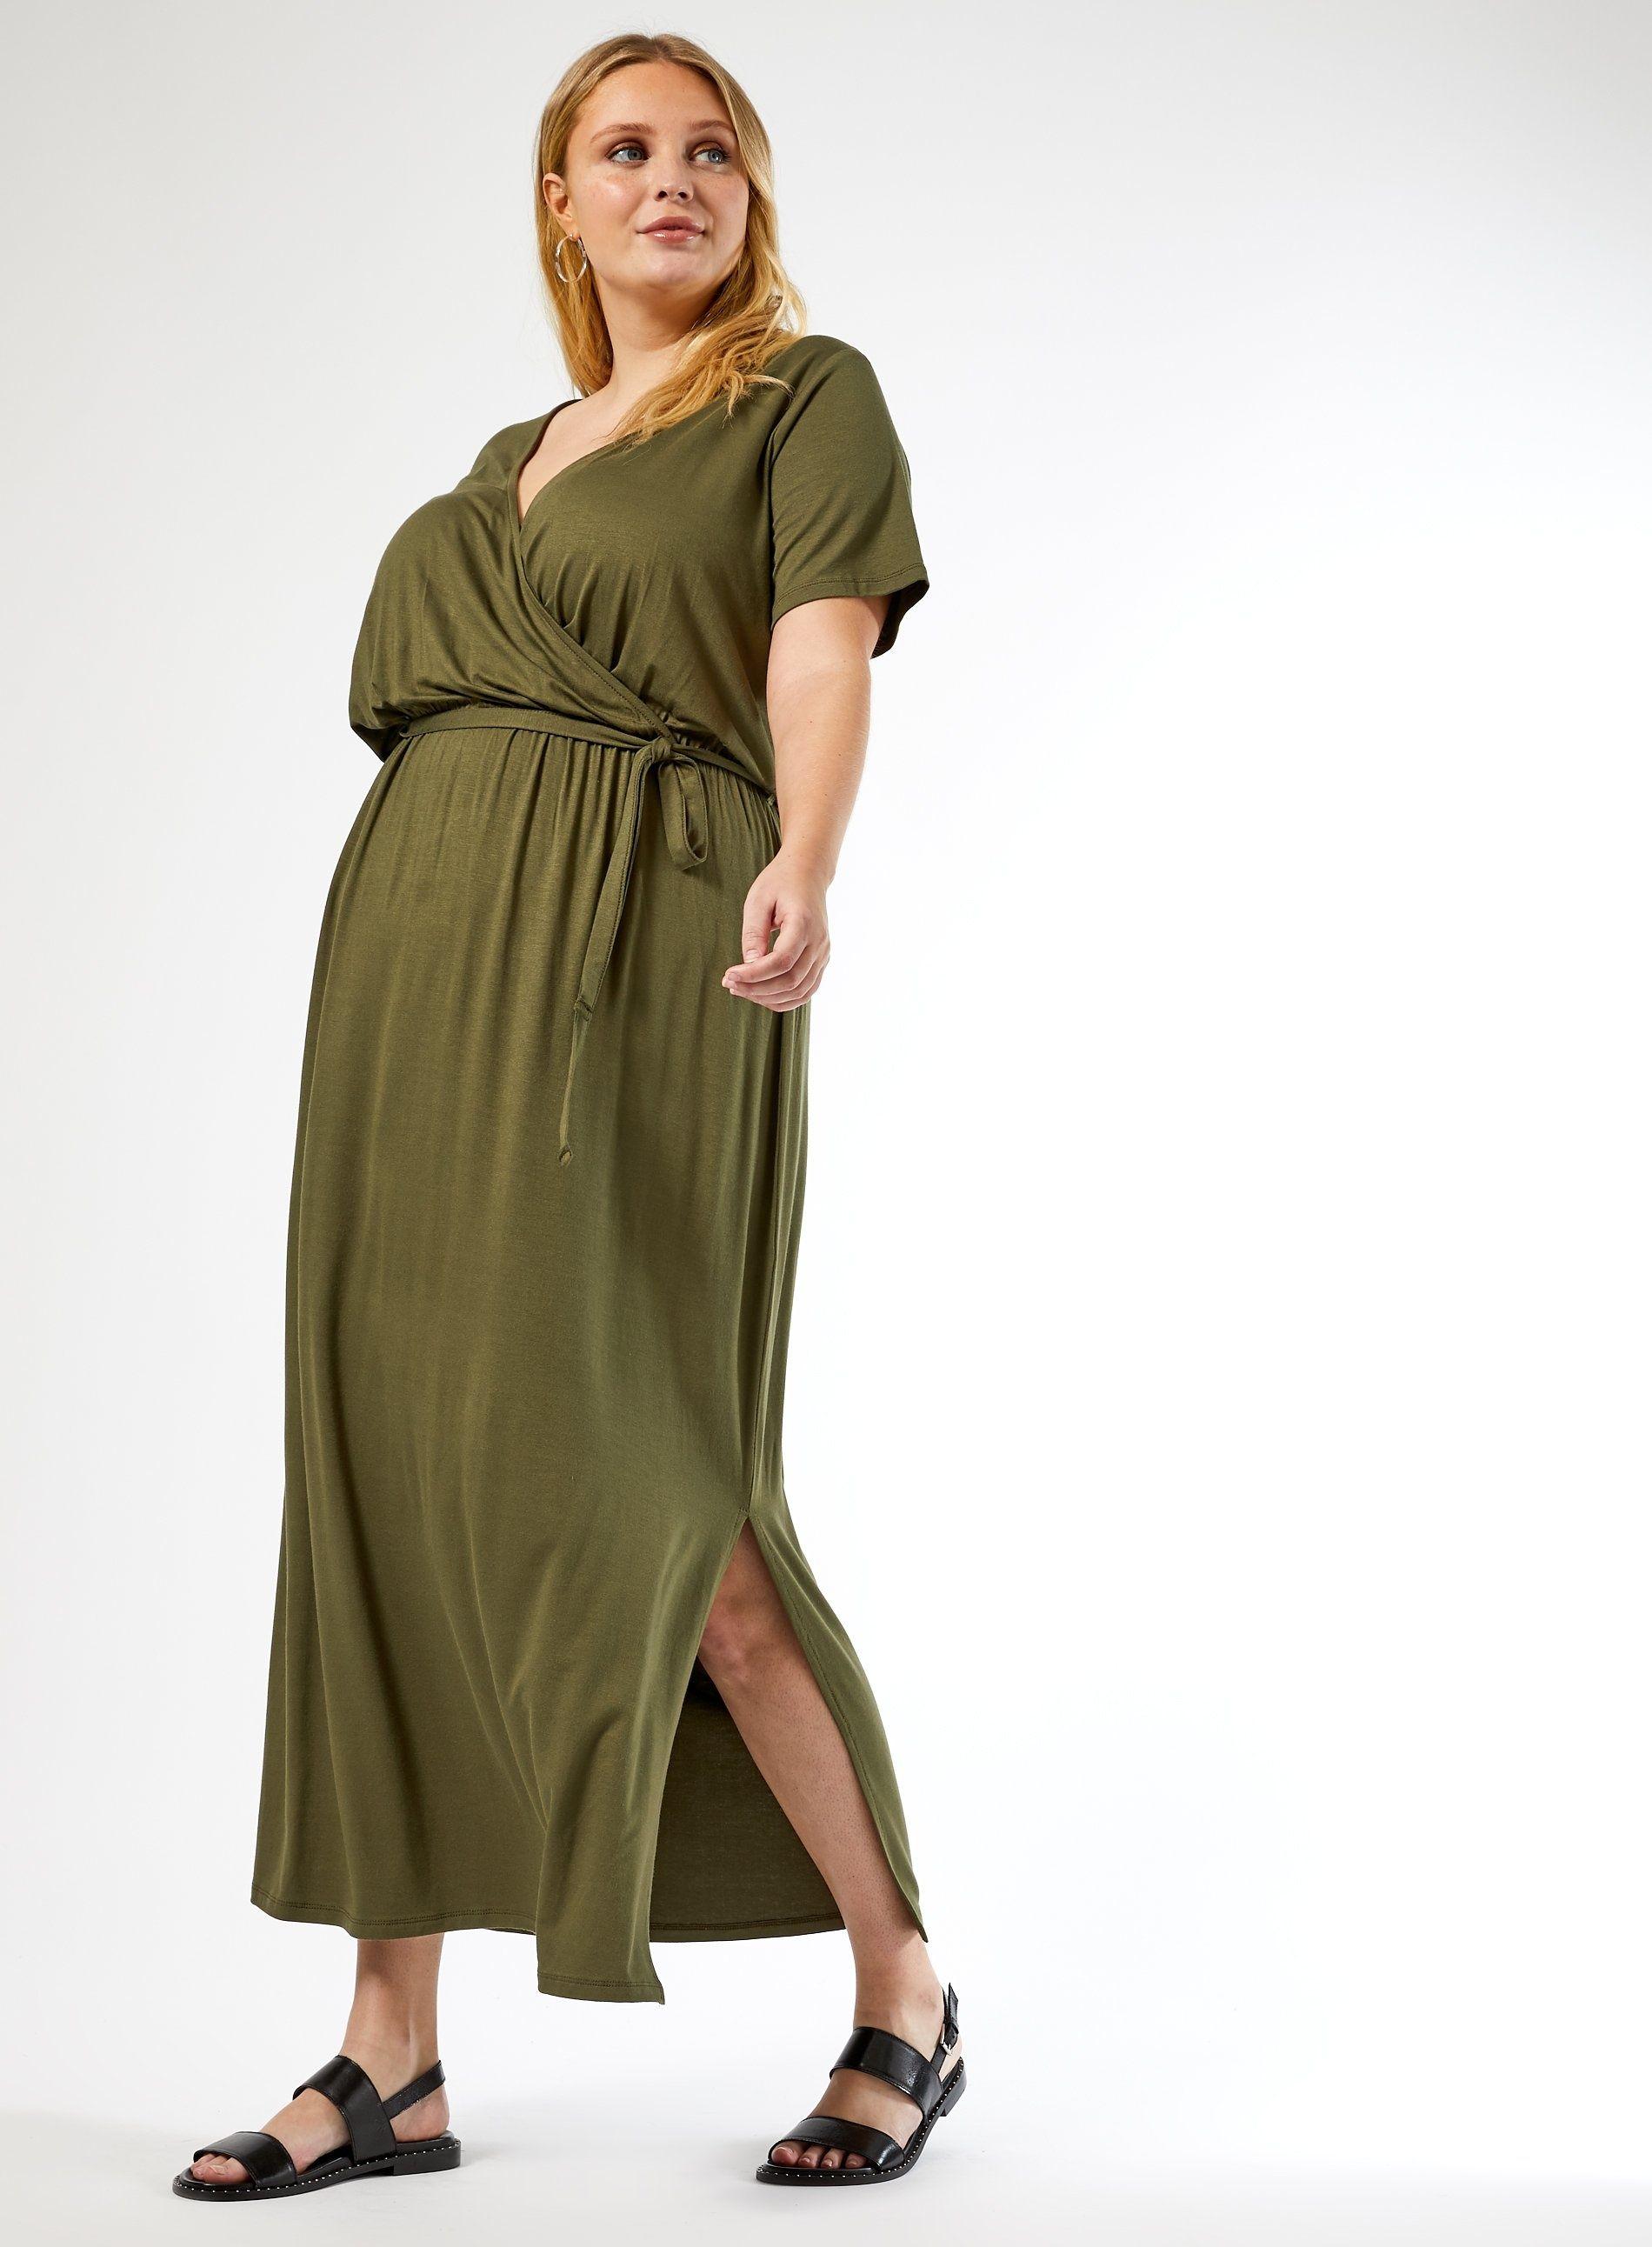 Dorothy Perkins Womens Curve Green Maxi Wrap Dress V-Neck Short Sleeve